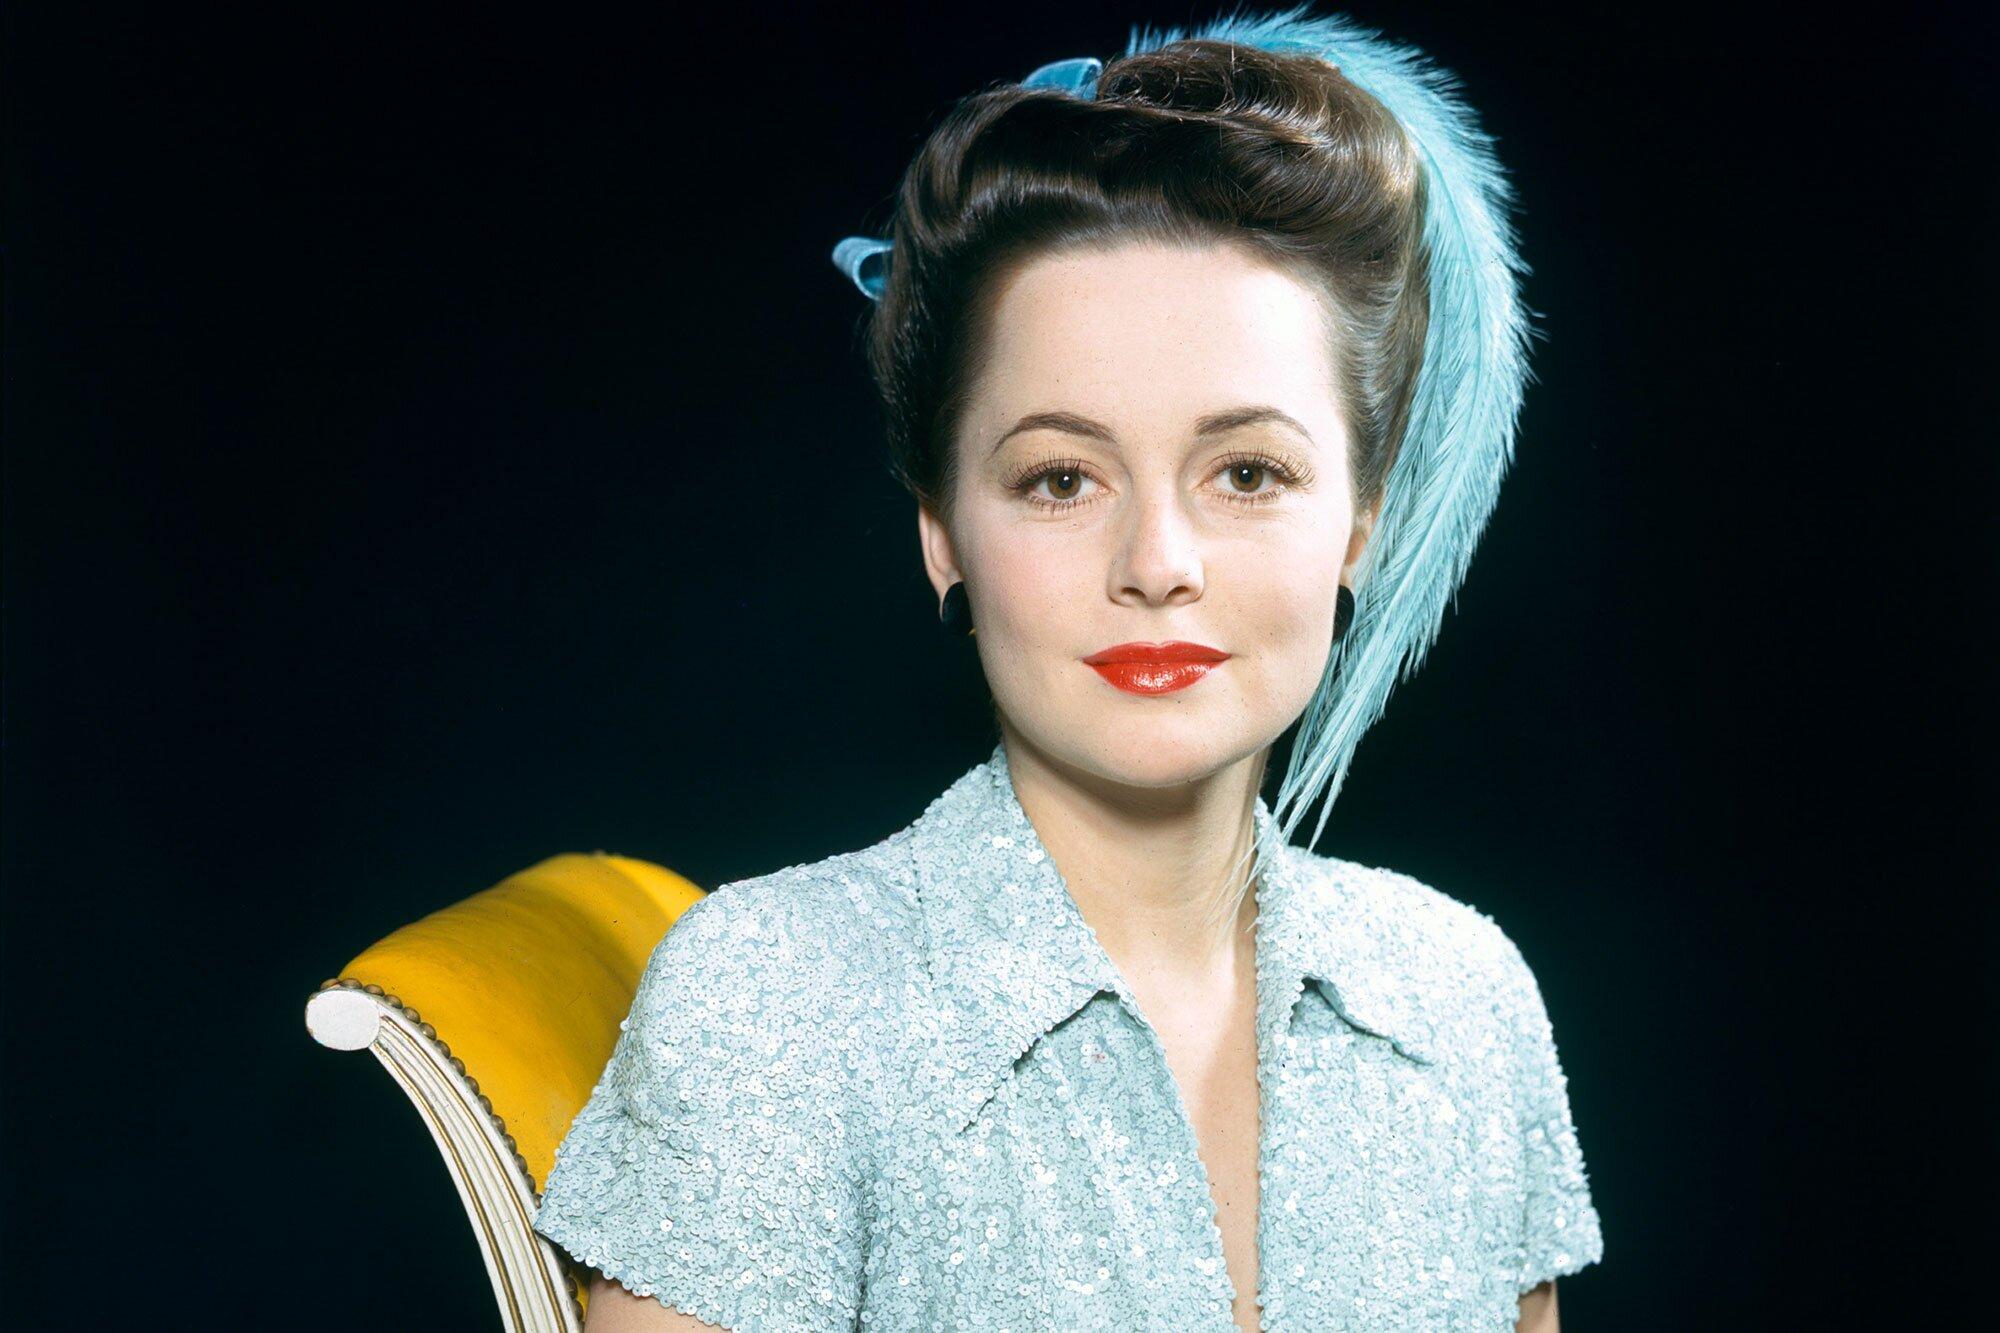 Gone With The Wind Star Olivia De Havilland Dies At 104 Ew Com